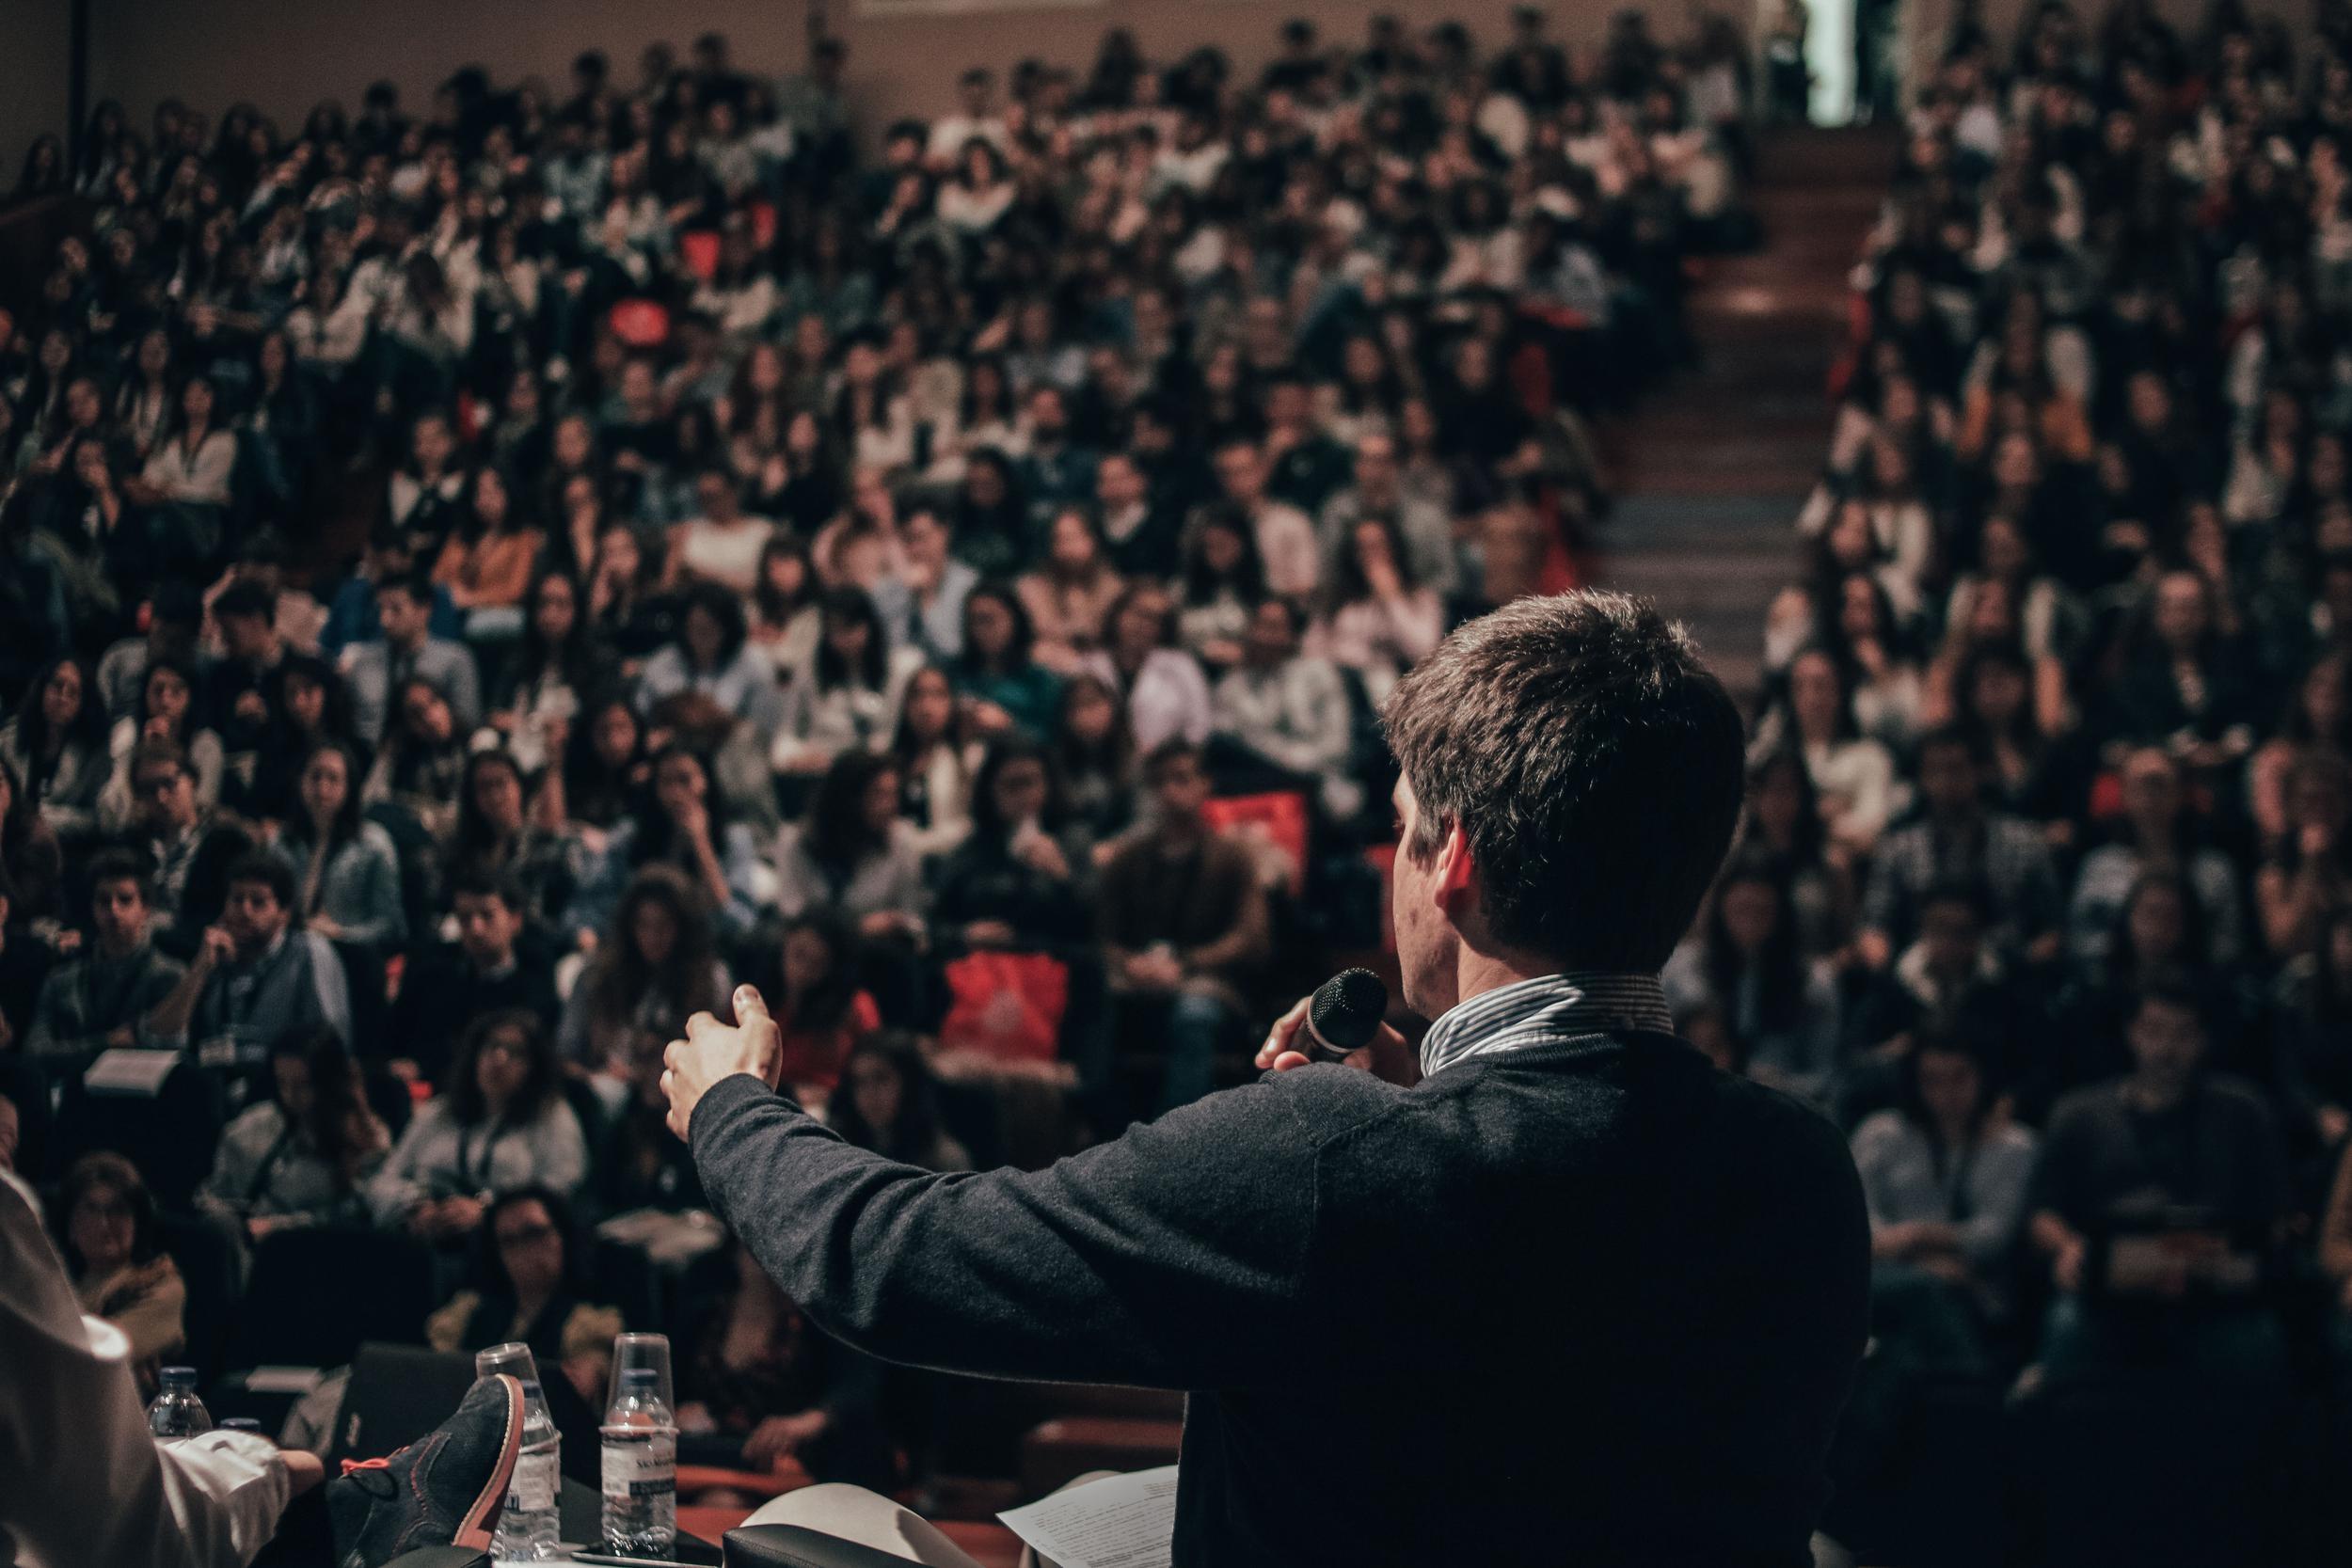 public speaking-unsplash.jpg